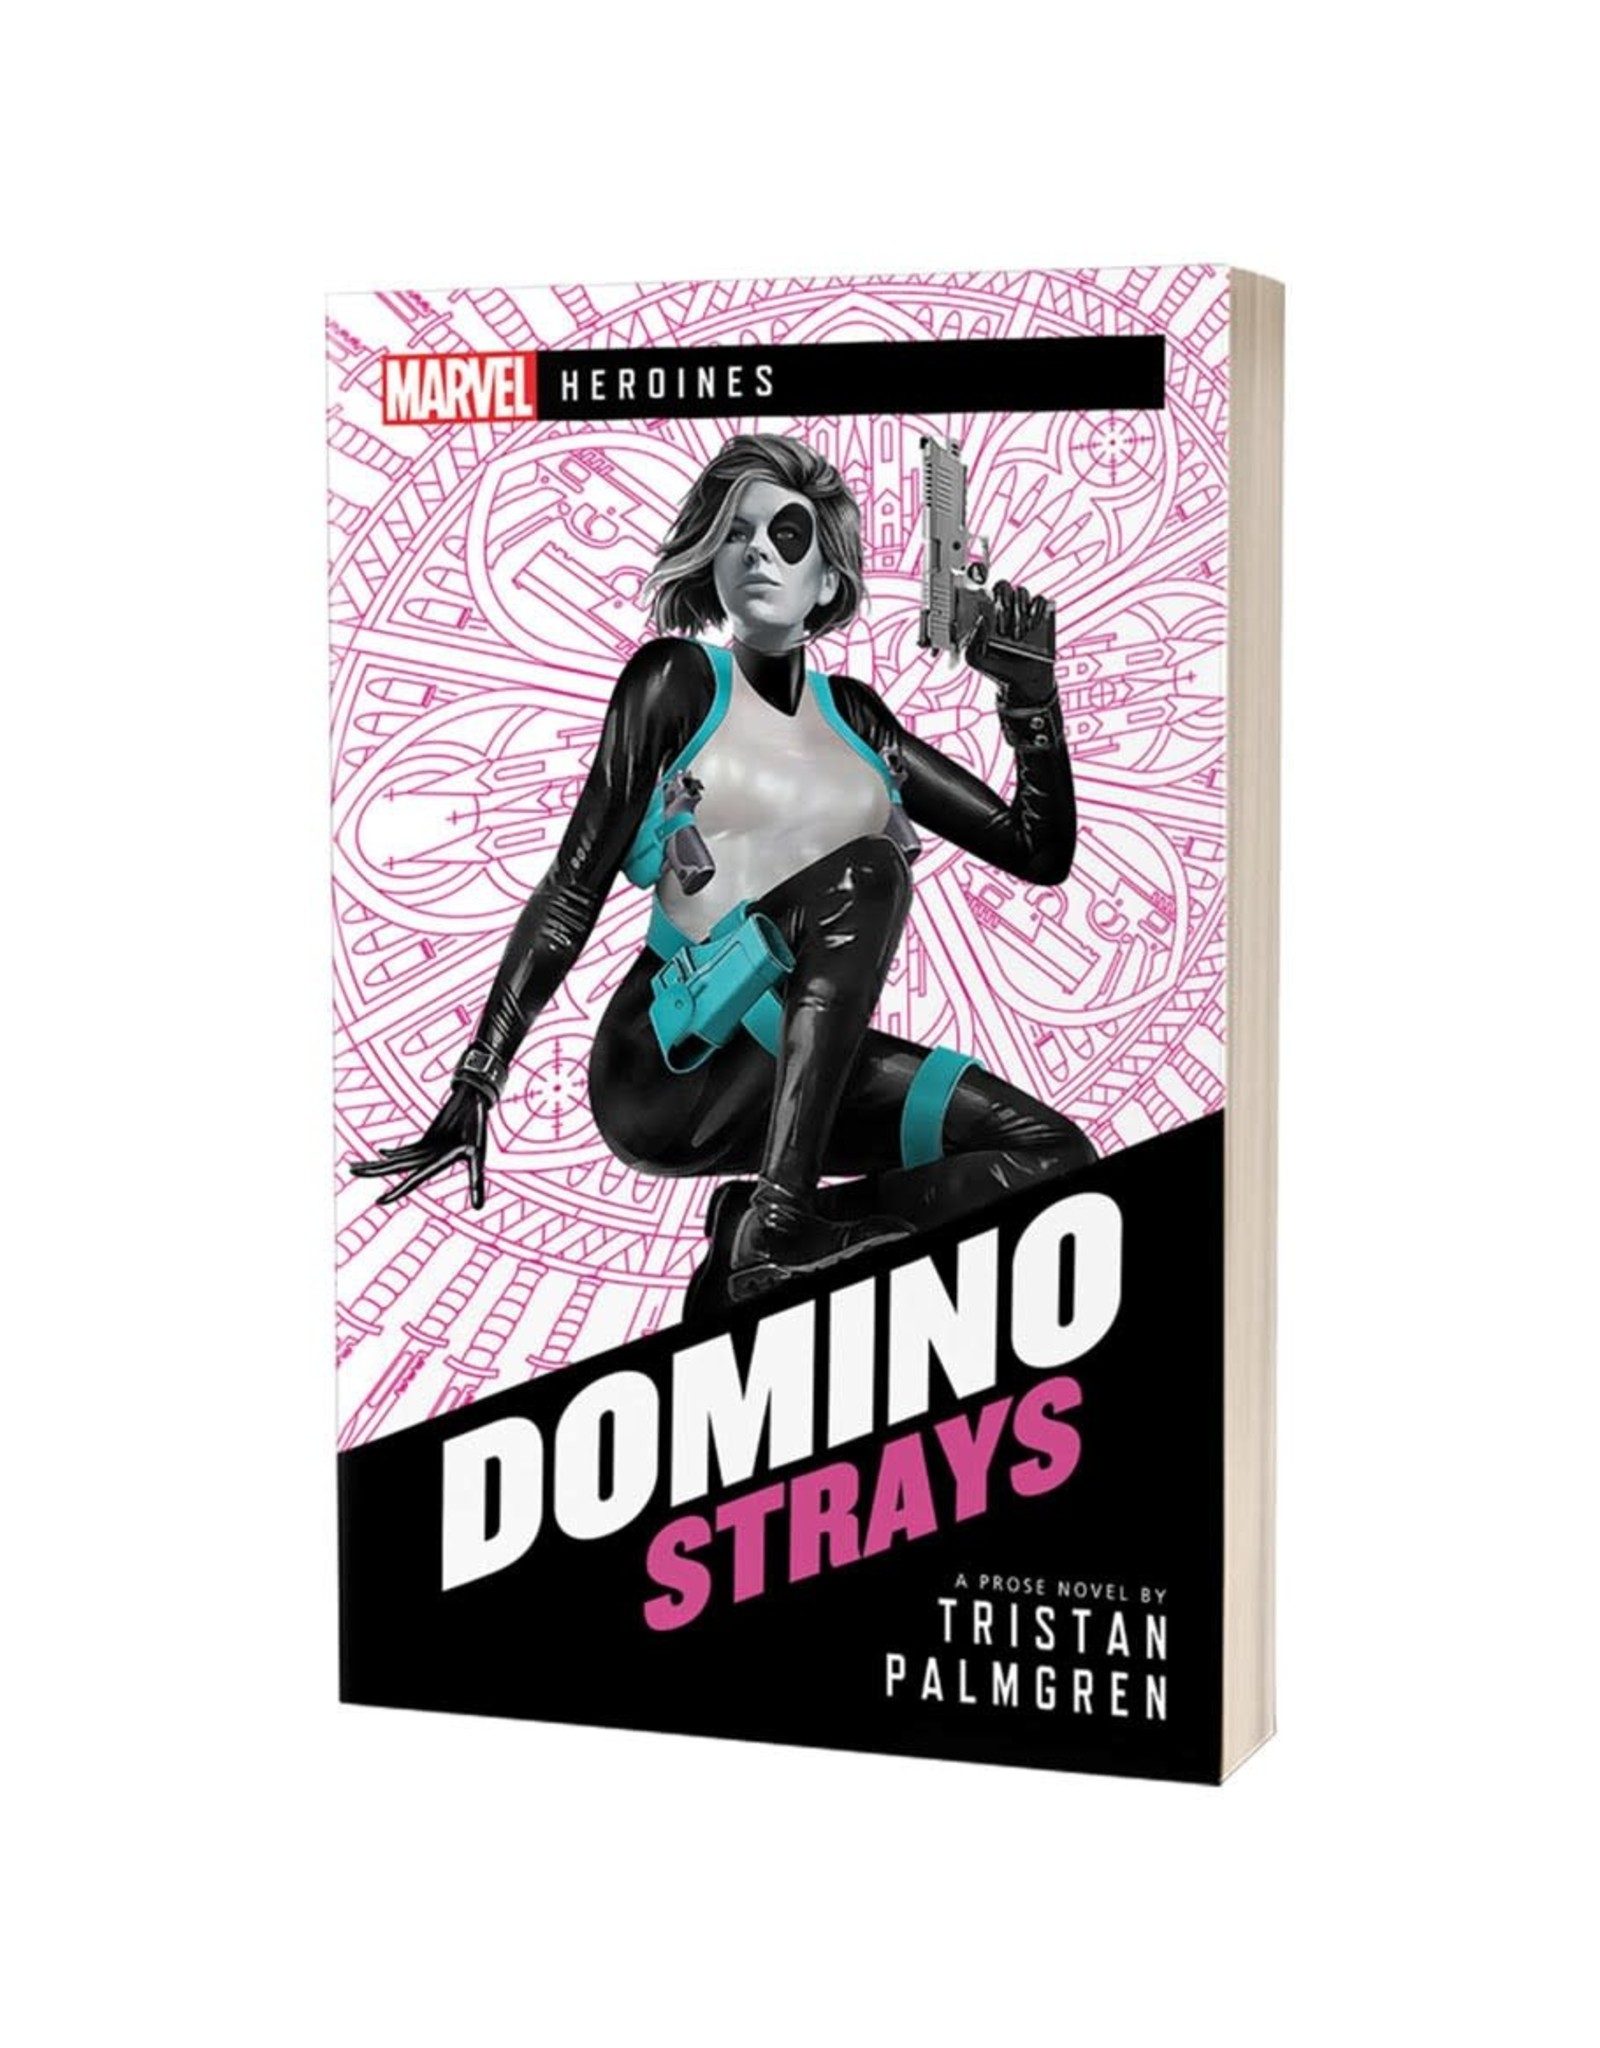 Asmodee Marvel Heroines: Domino - Strays (Novel)